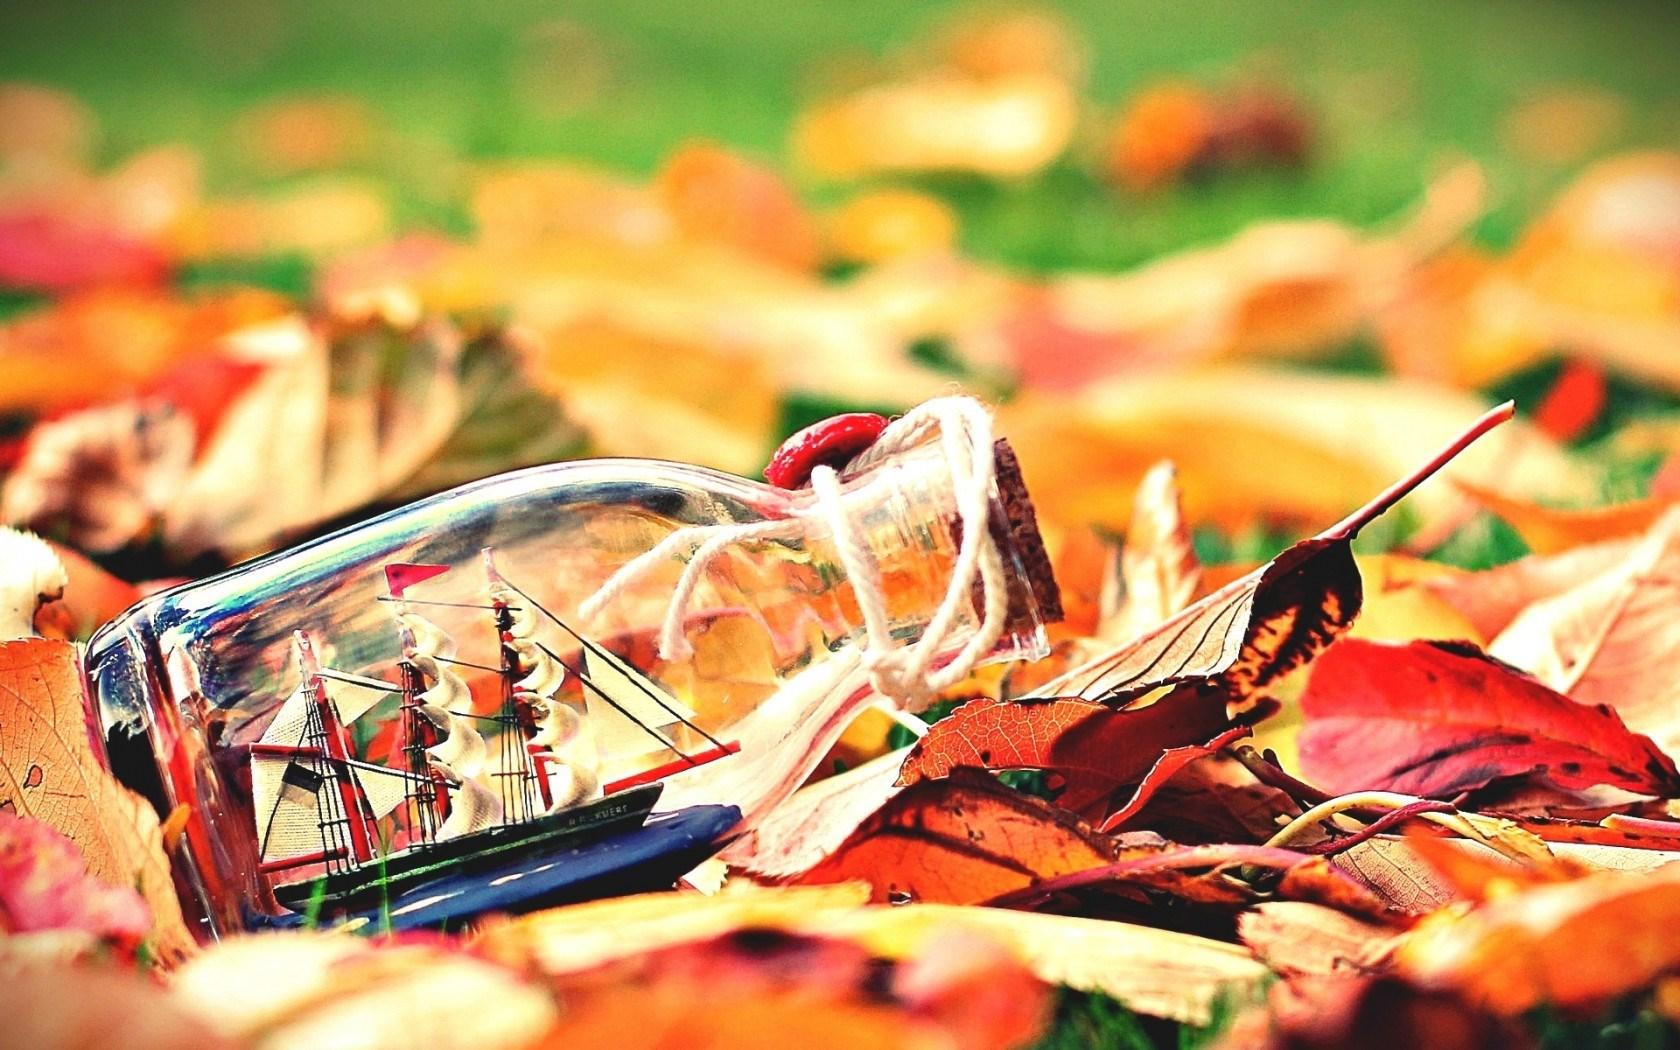 Mood Leaves Bottle Boat Ship Sail Autumn Nature